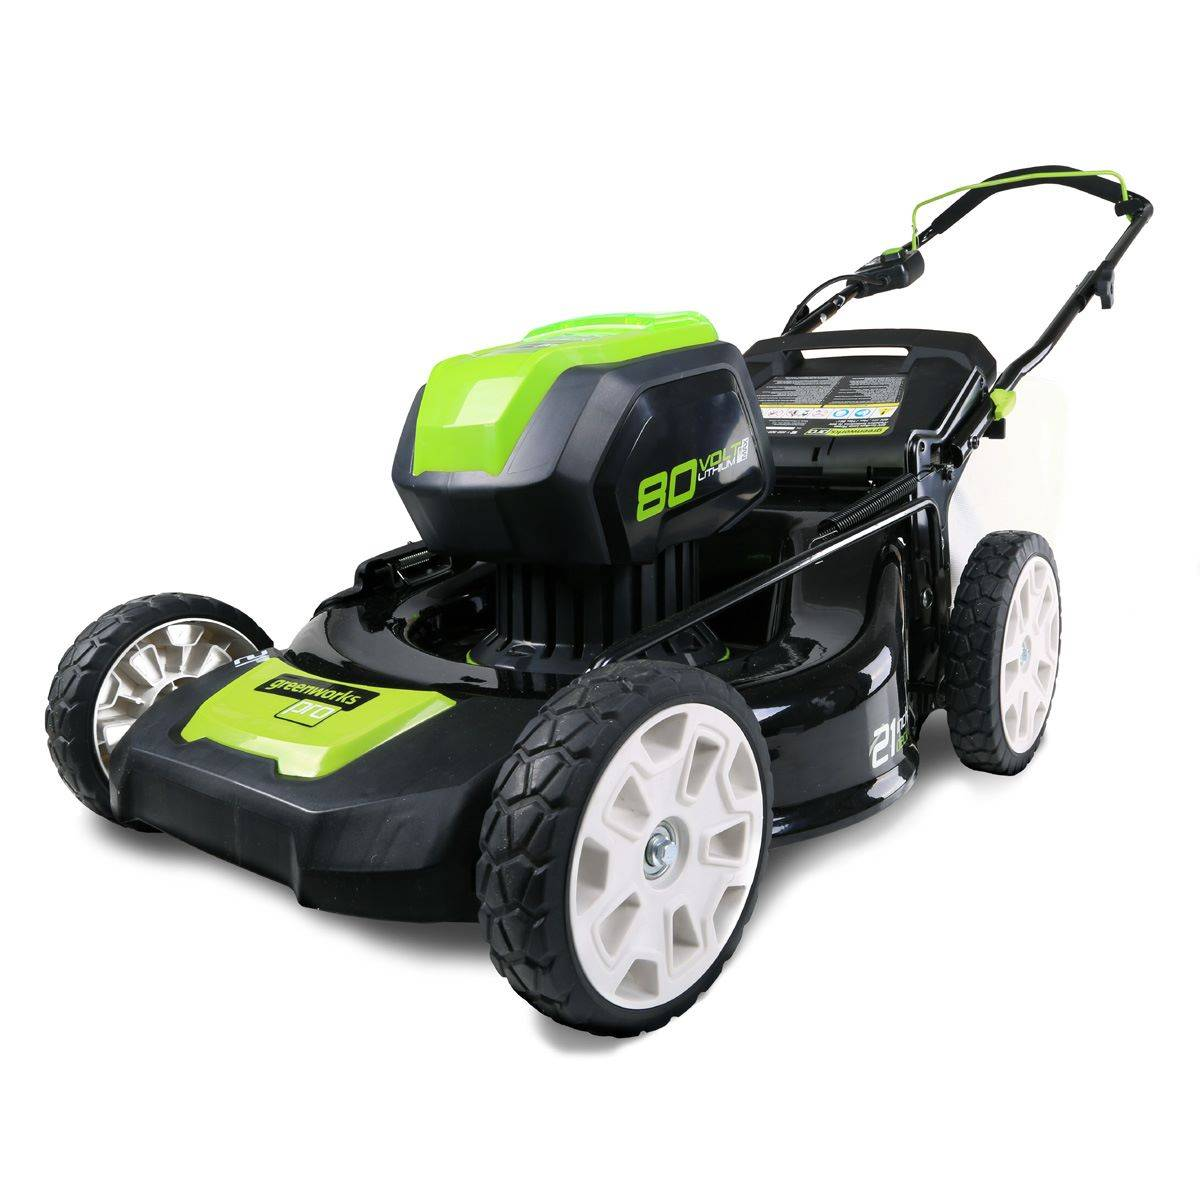 Greenworks Tools – Tondeuse À Gazon Sur Batterie Greenworks 80v (sans Batterie Ni Chargeur)